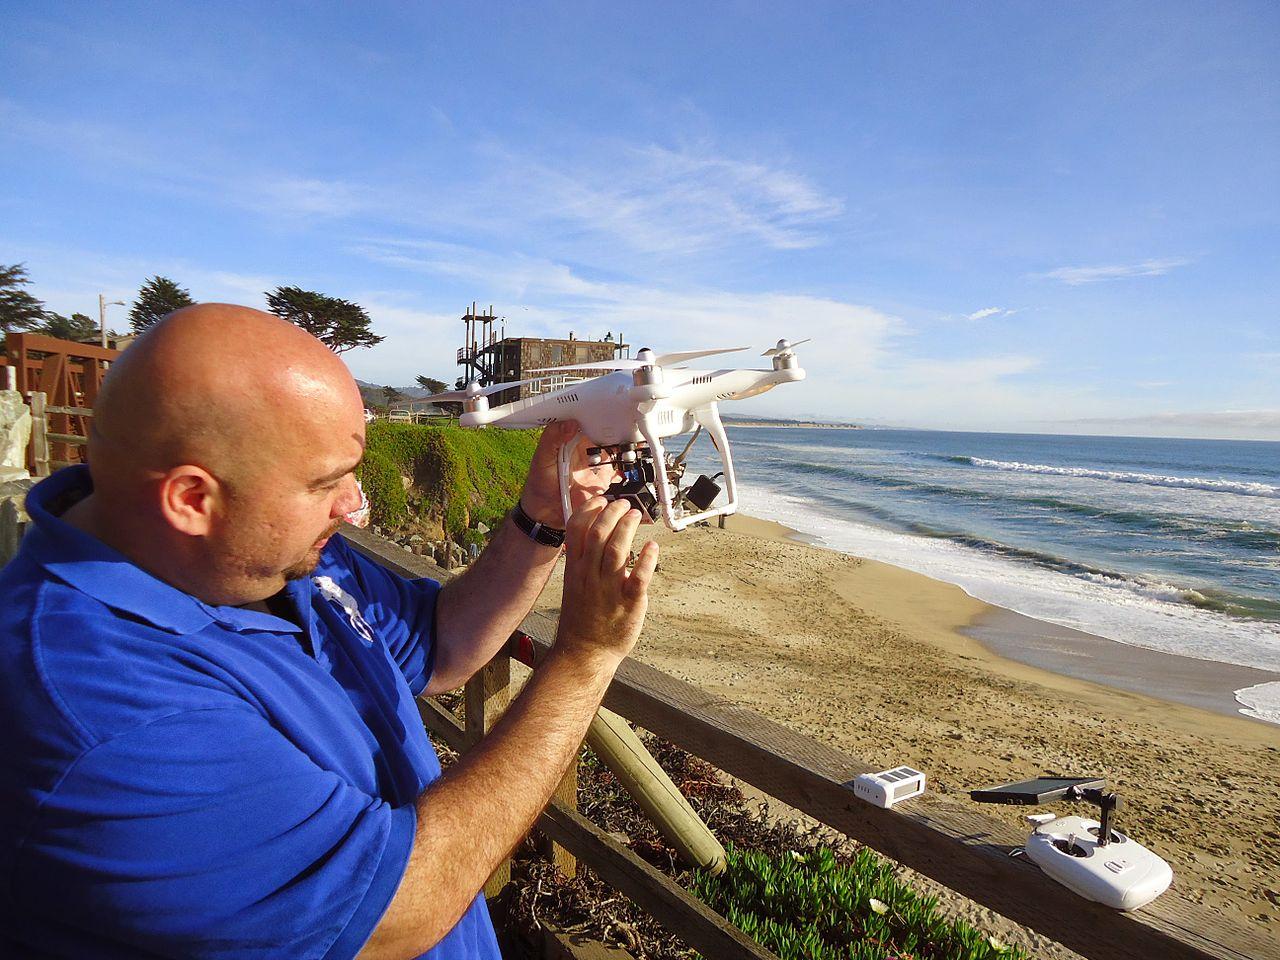 Drone Pilots No Longer Have to Register